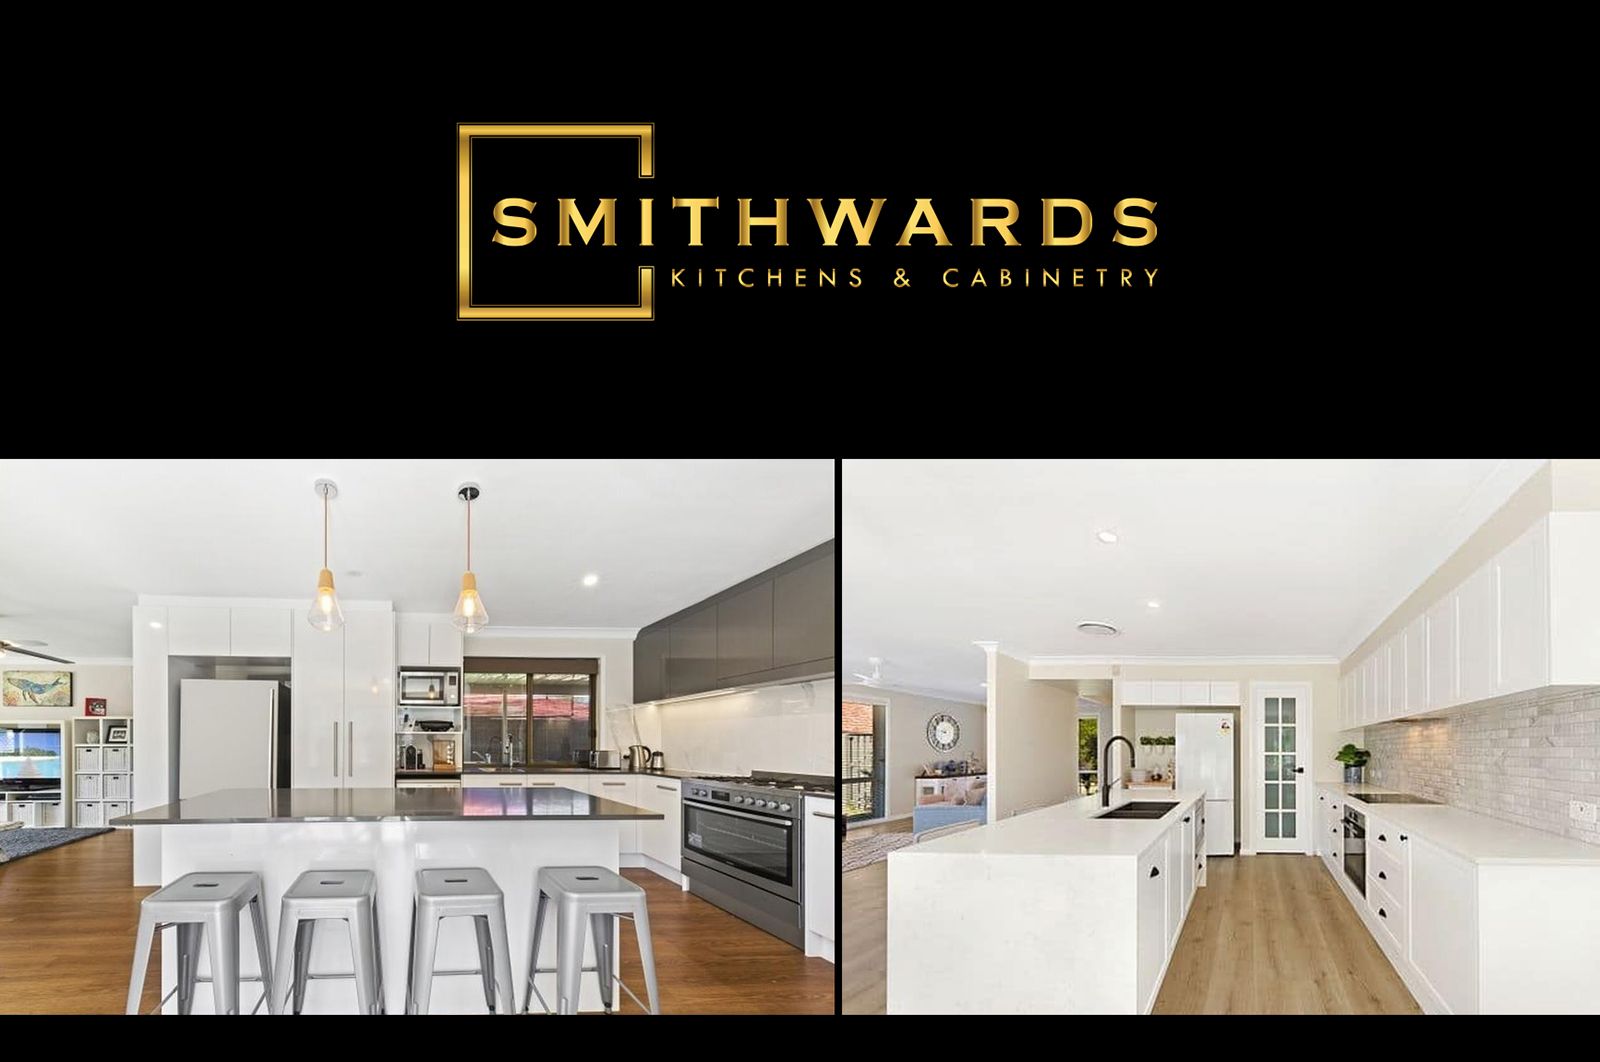 Smithwards Kitchens